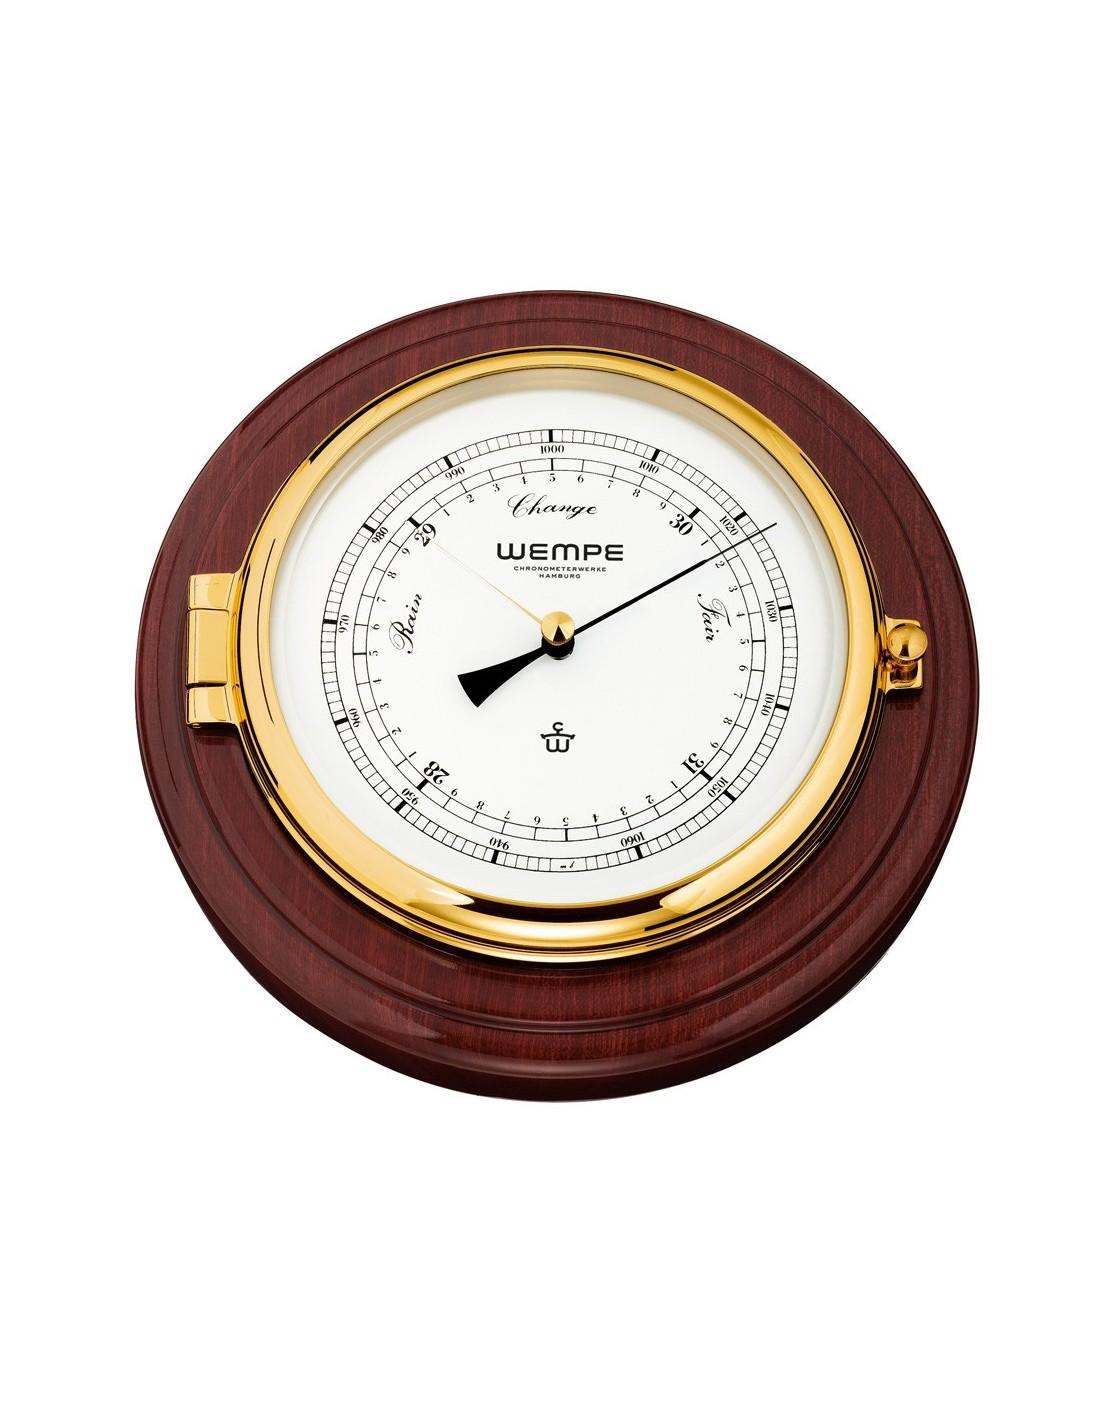 SKIPPER - Barometer Op Mahoniehouten plank - Messing - 210 x 50 mm